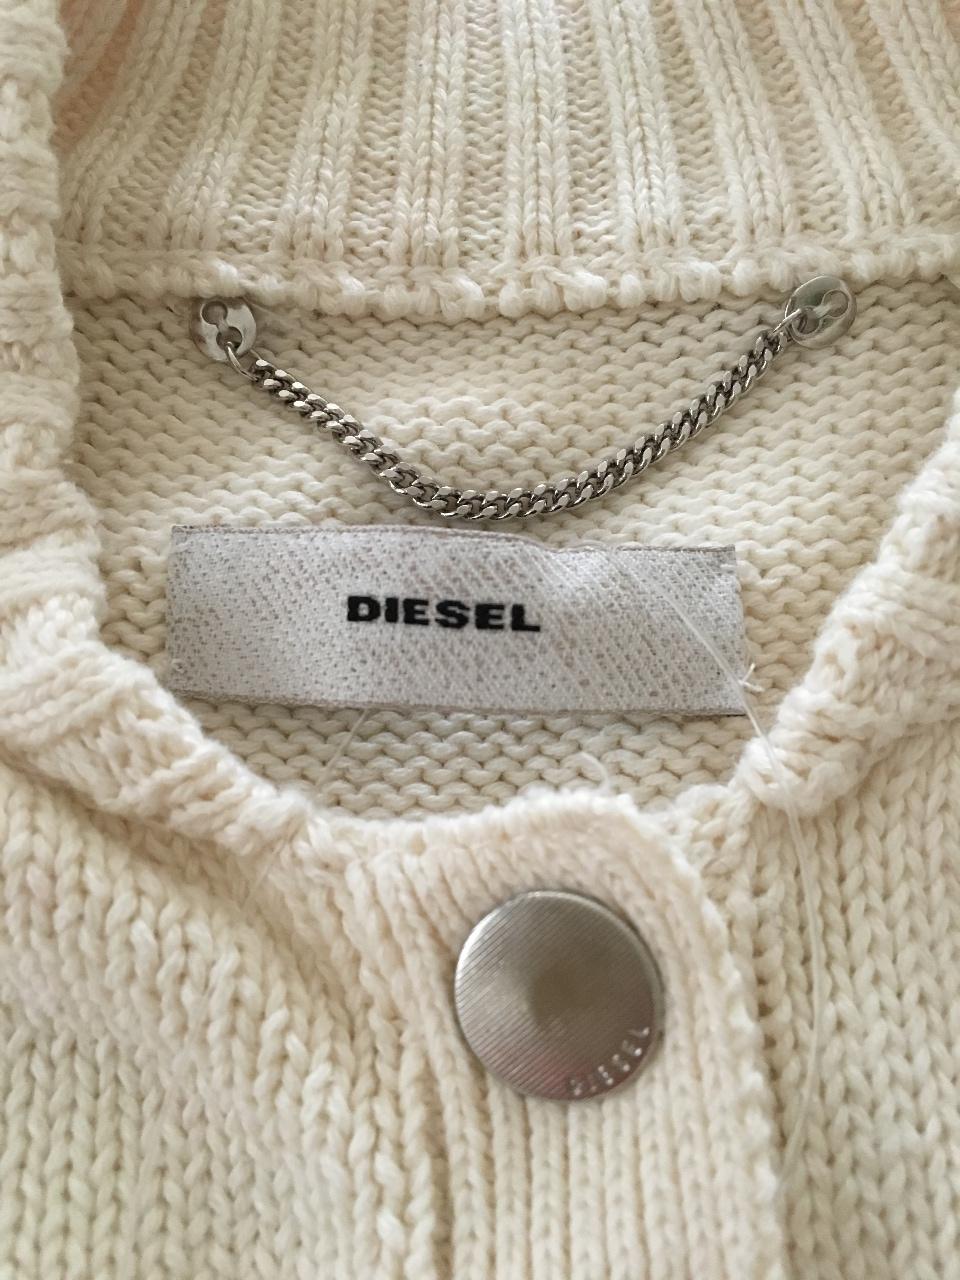 DIESEL(ディーゼル)のカーディガン